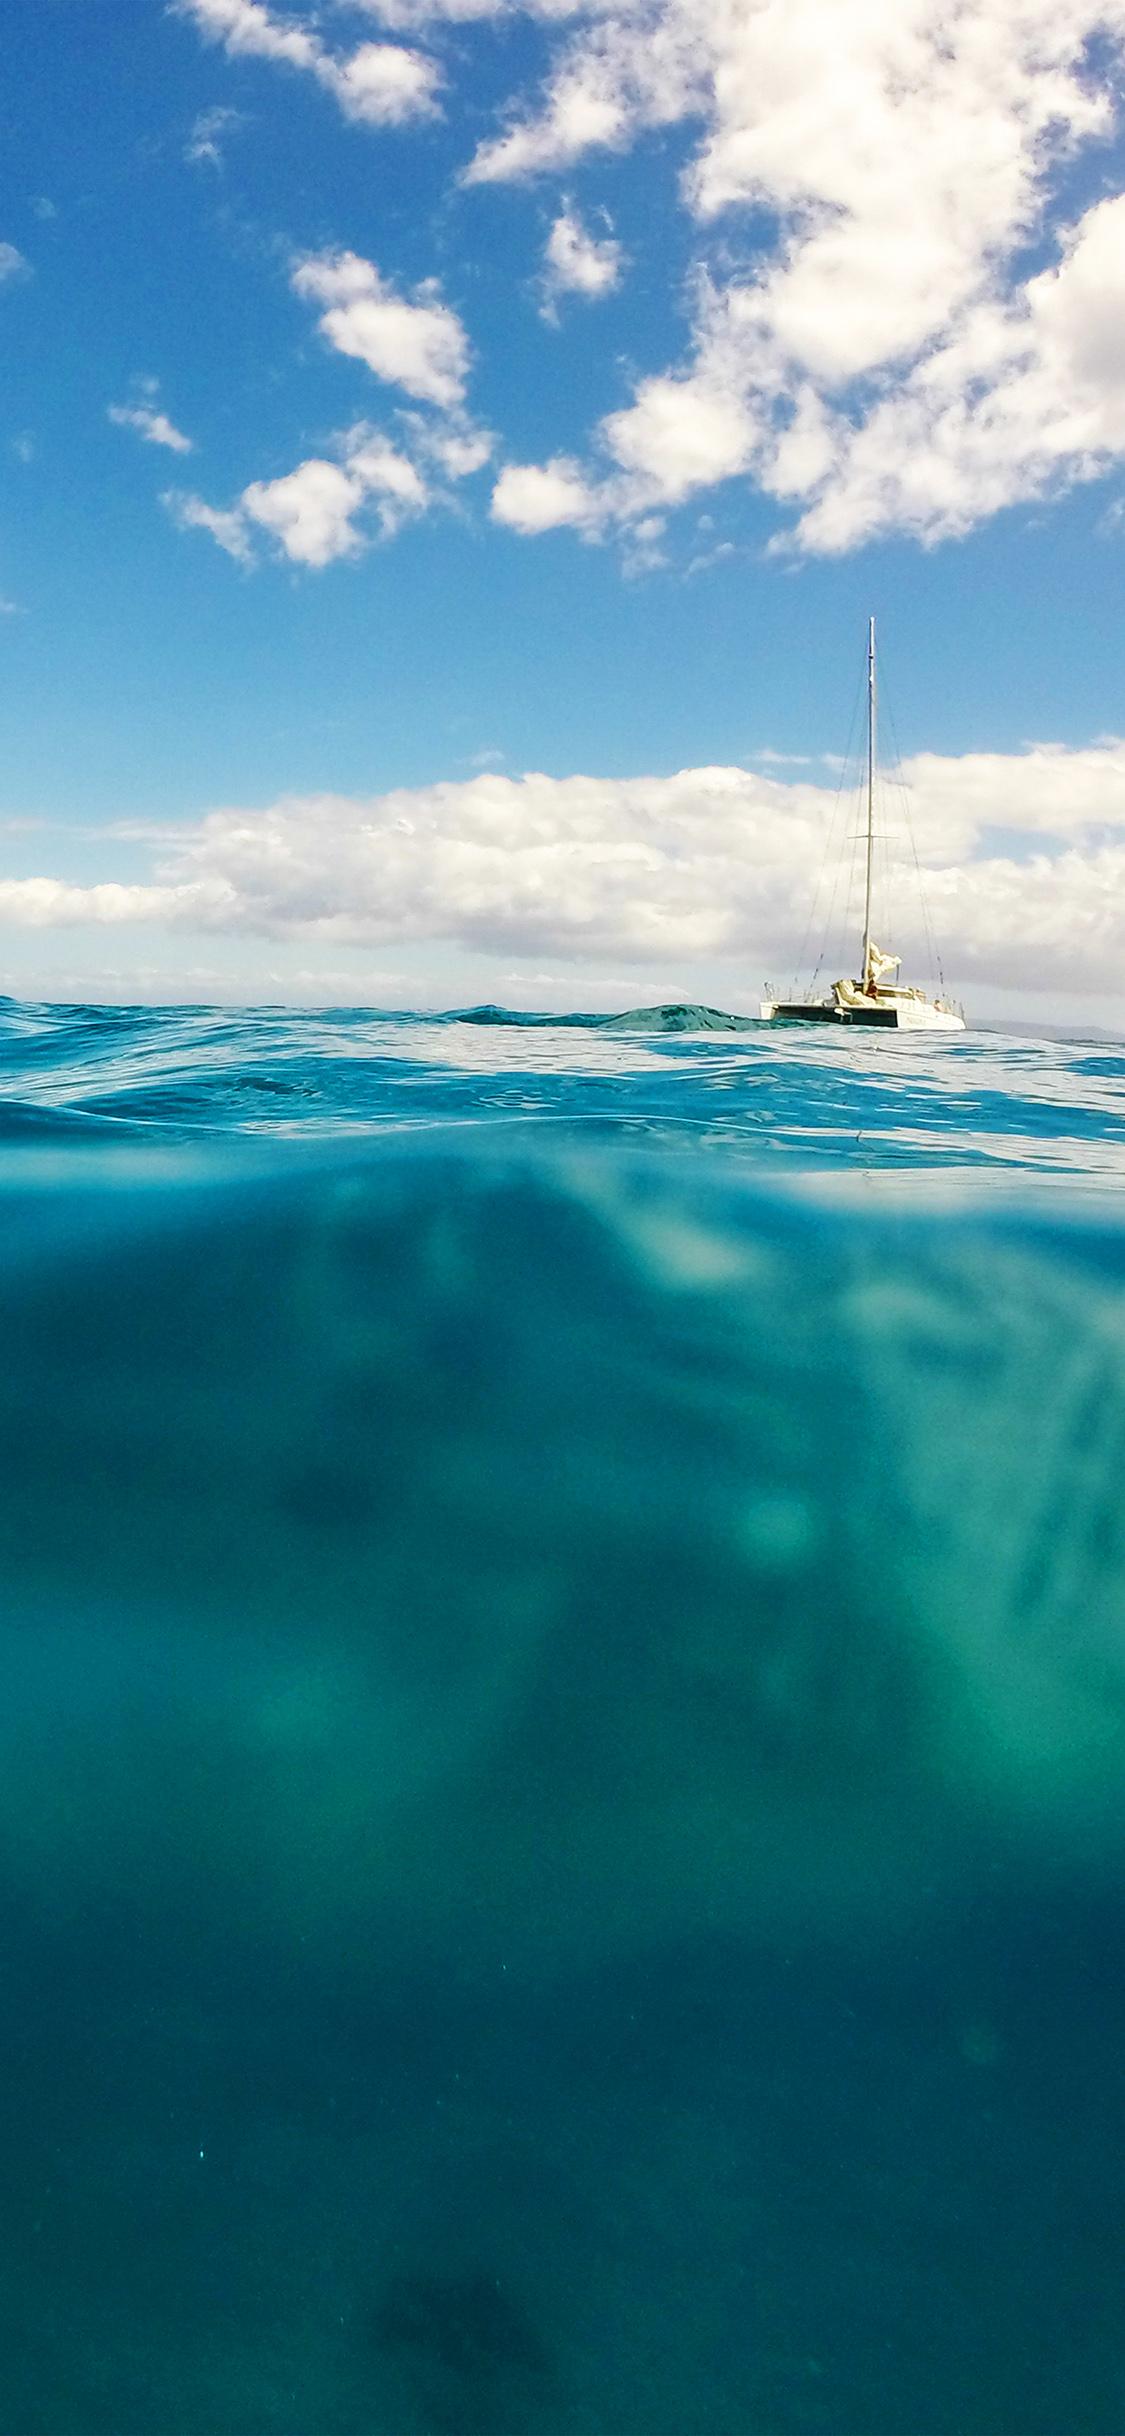 iPhoneXpapers.com-Apple-iPhone-wallpaper-ni10-sea-ocean-boat-summer-vacation-blue-green